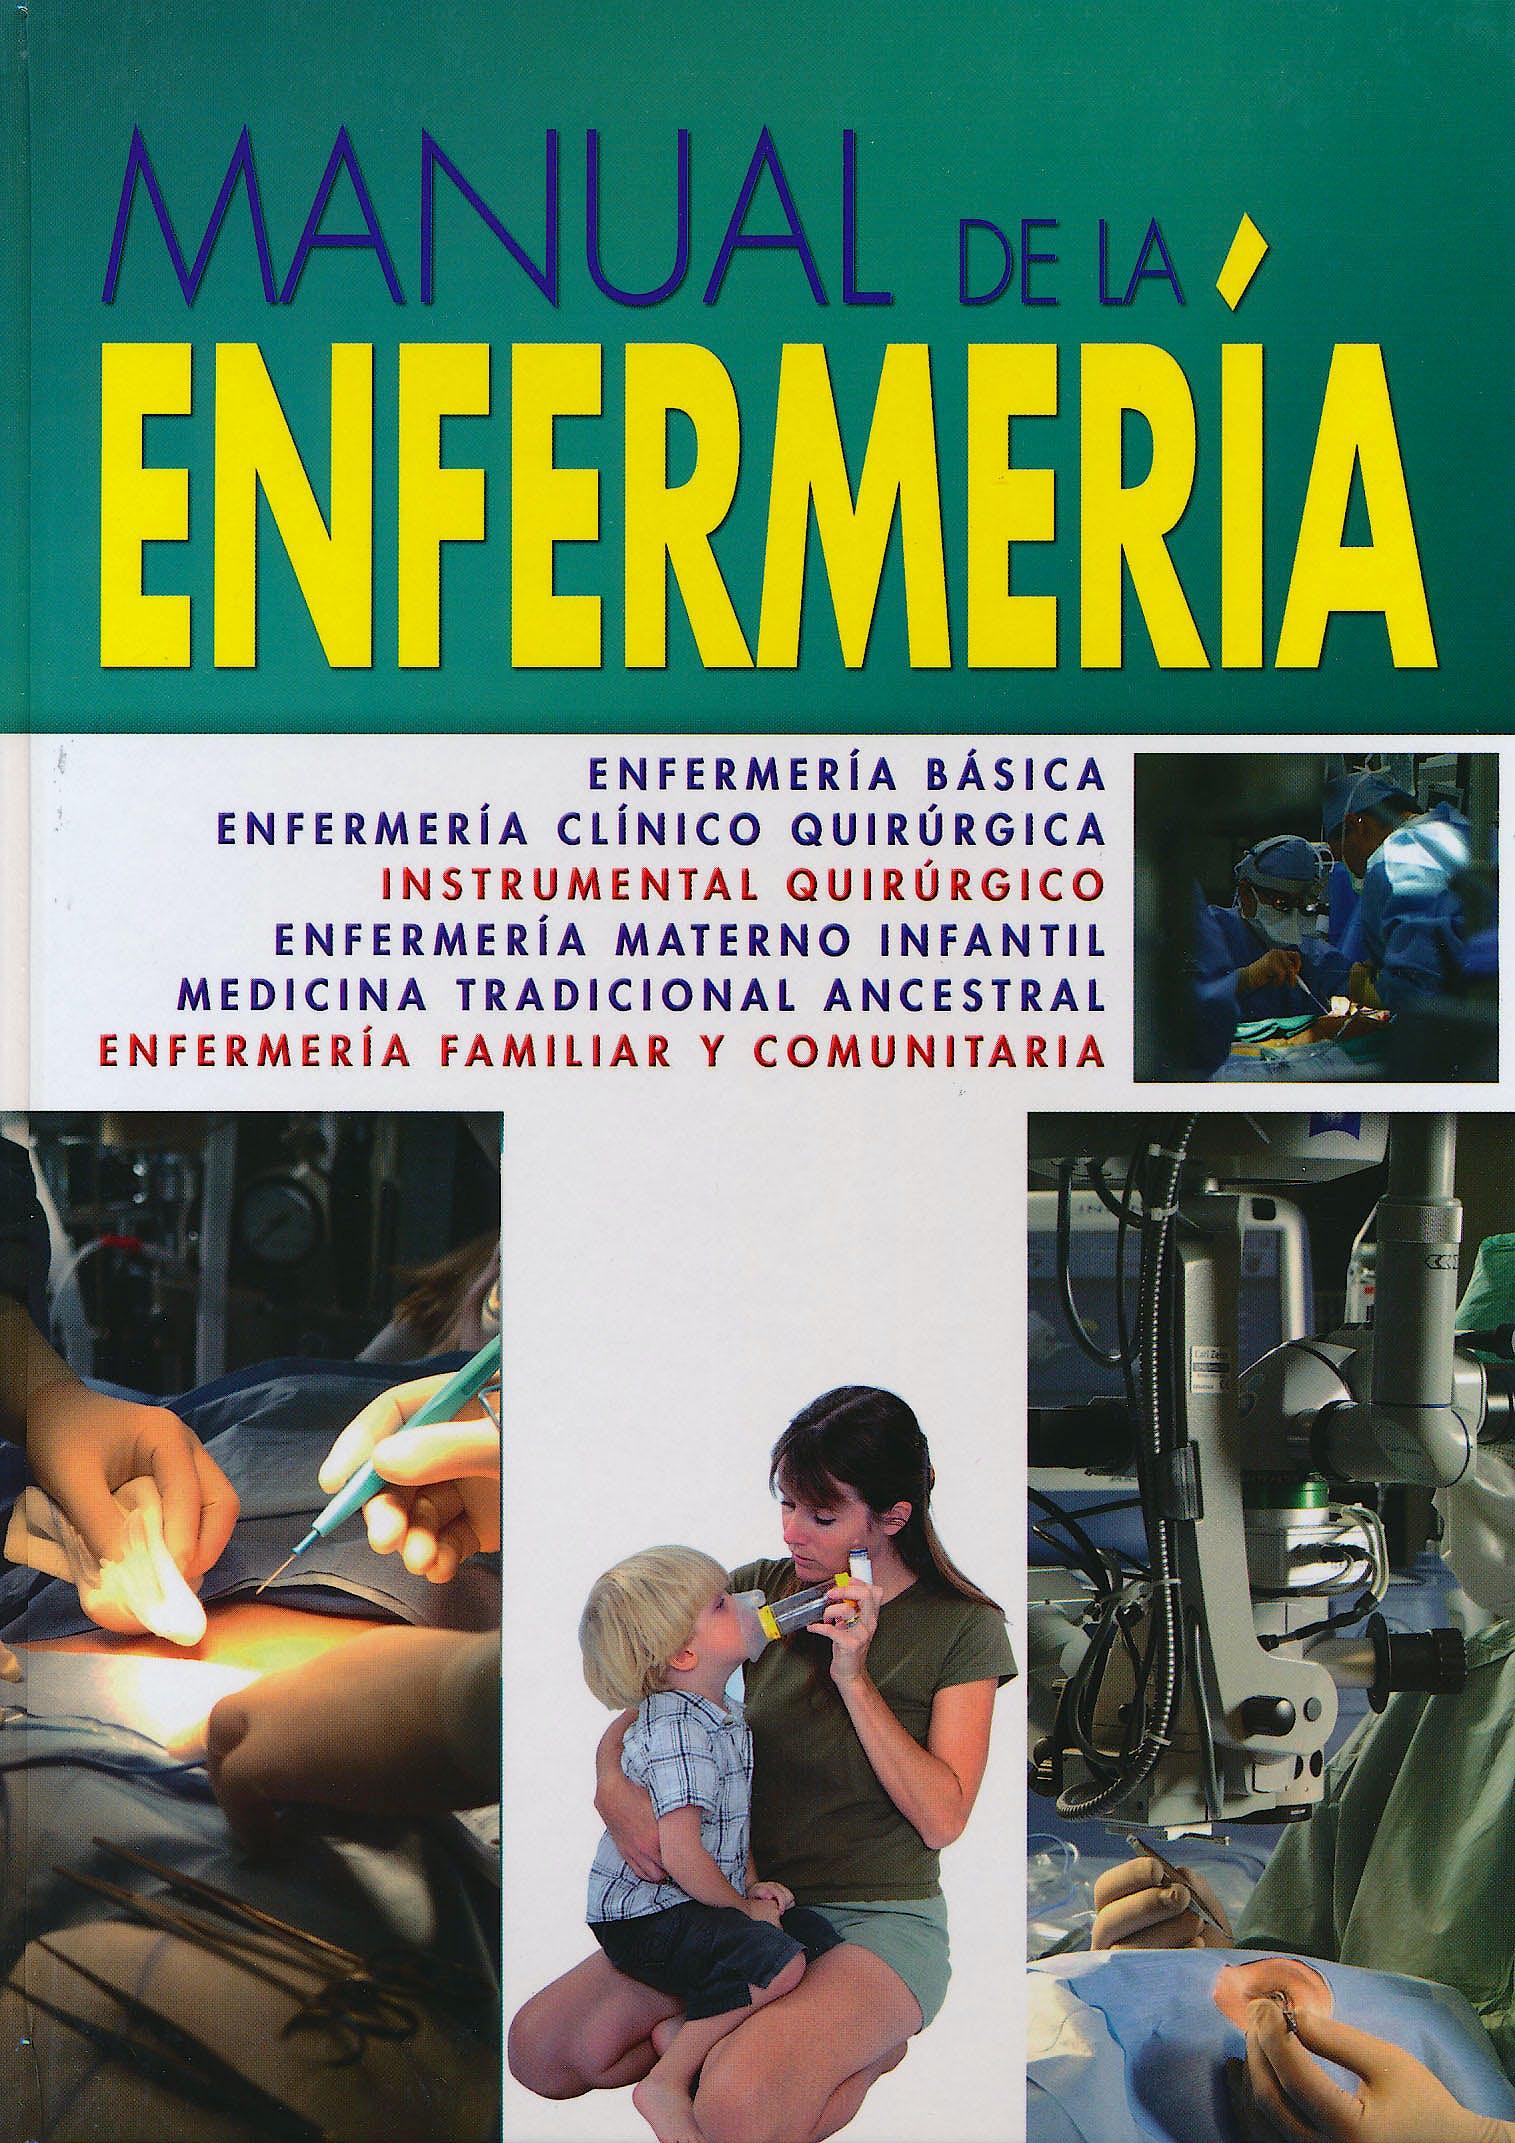 Portada del libro 9788480558686 Manual de la Enfermeria. Enfermeria Basica - Clinico Quirurgica - Materno Infantil - Medicina Tradicional Ancestral